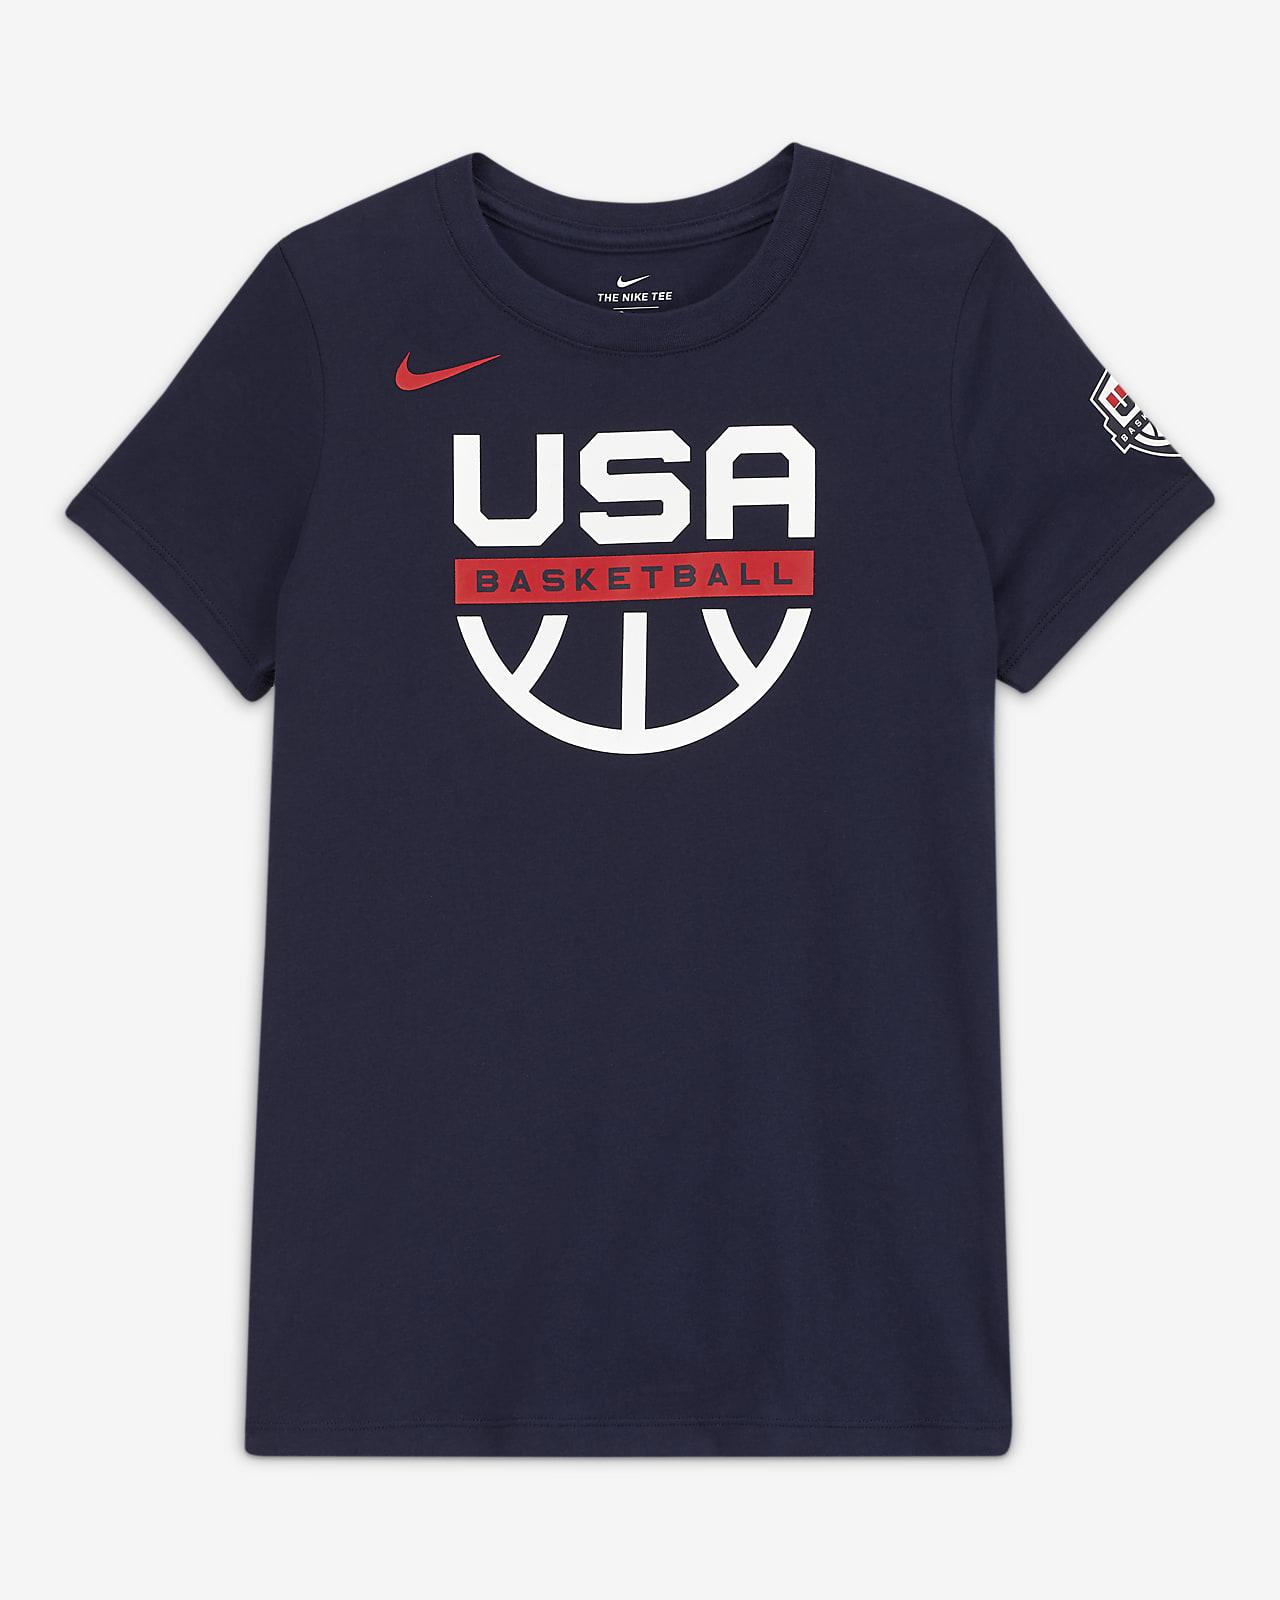 USAB Women's Basketball Training T-Shirt